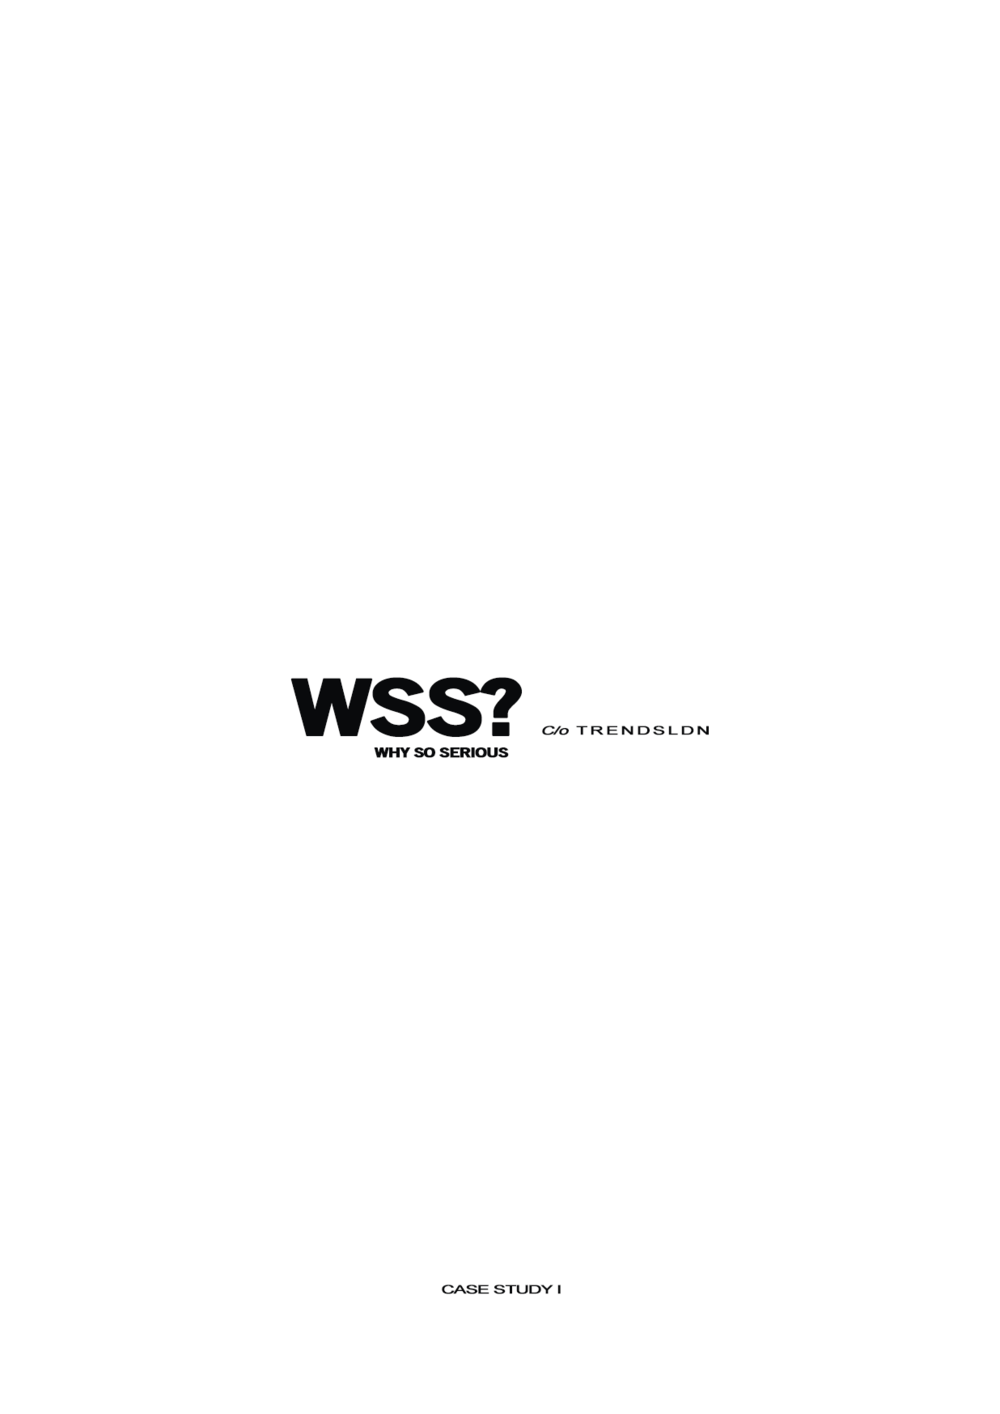 WSSHEAER.png